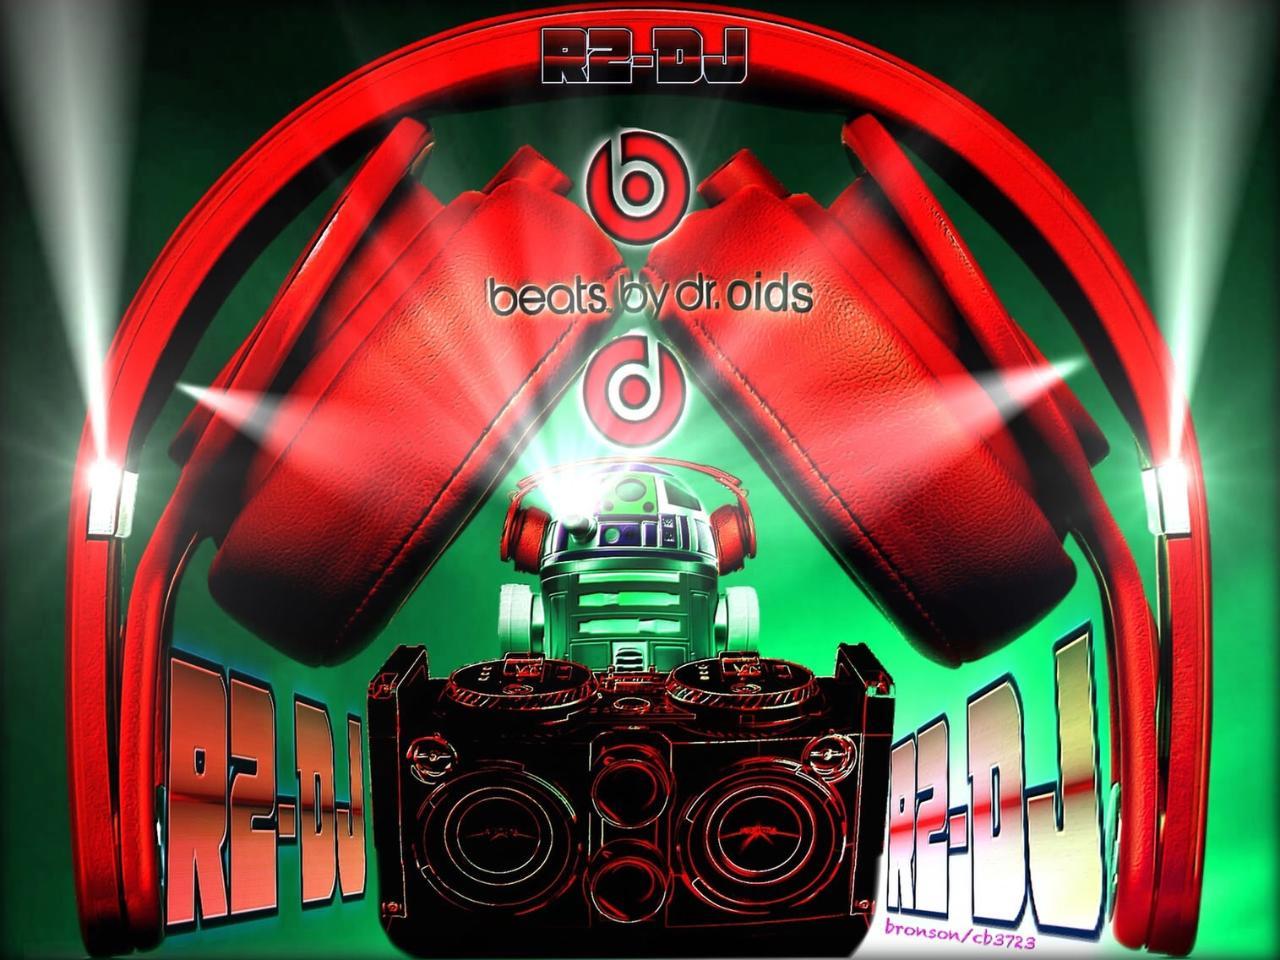 Beats Mixr Red Vs R2 DJ version 2 photo manipulation pop art